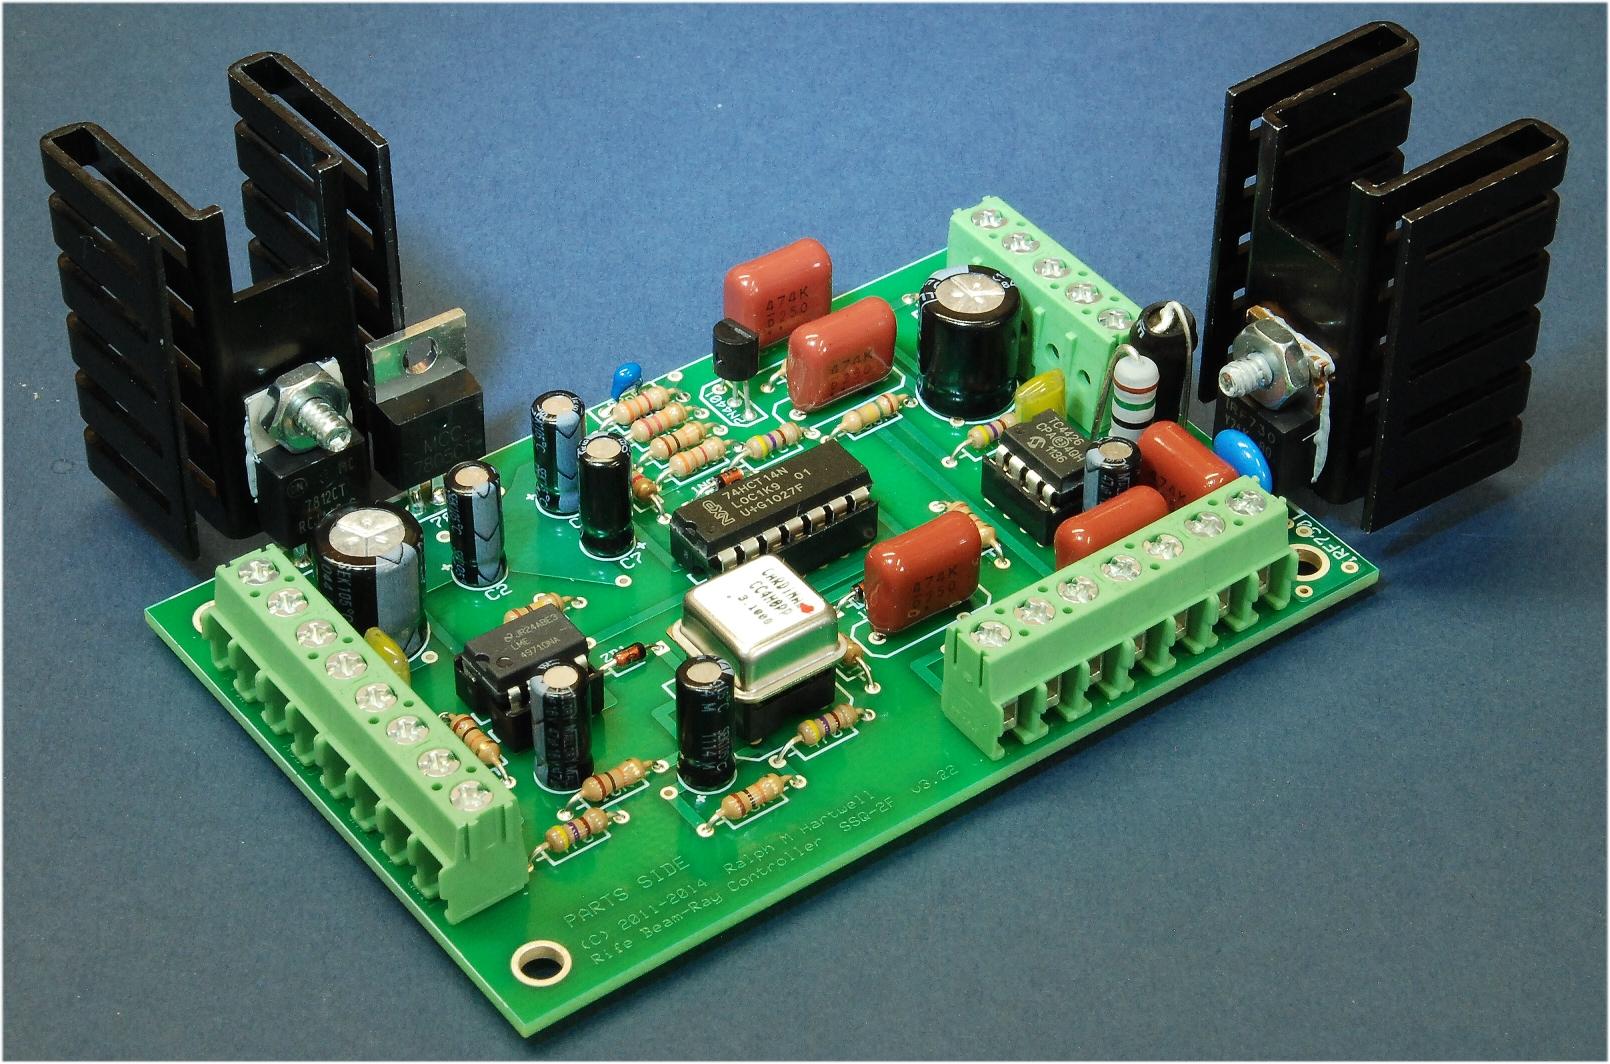 The SSQ-2F v3 21 Rife Controller